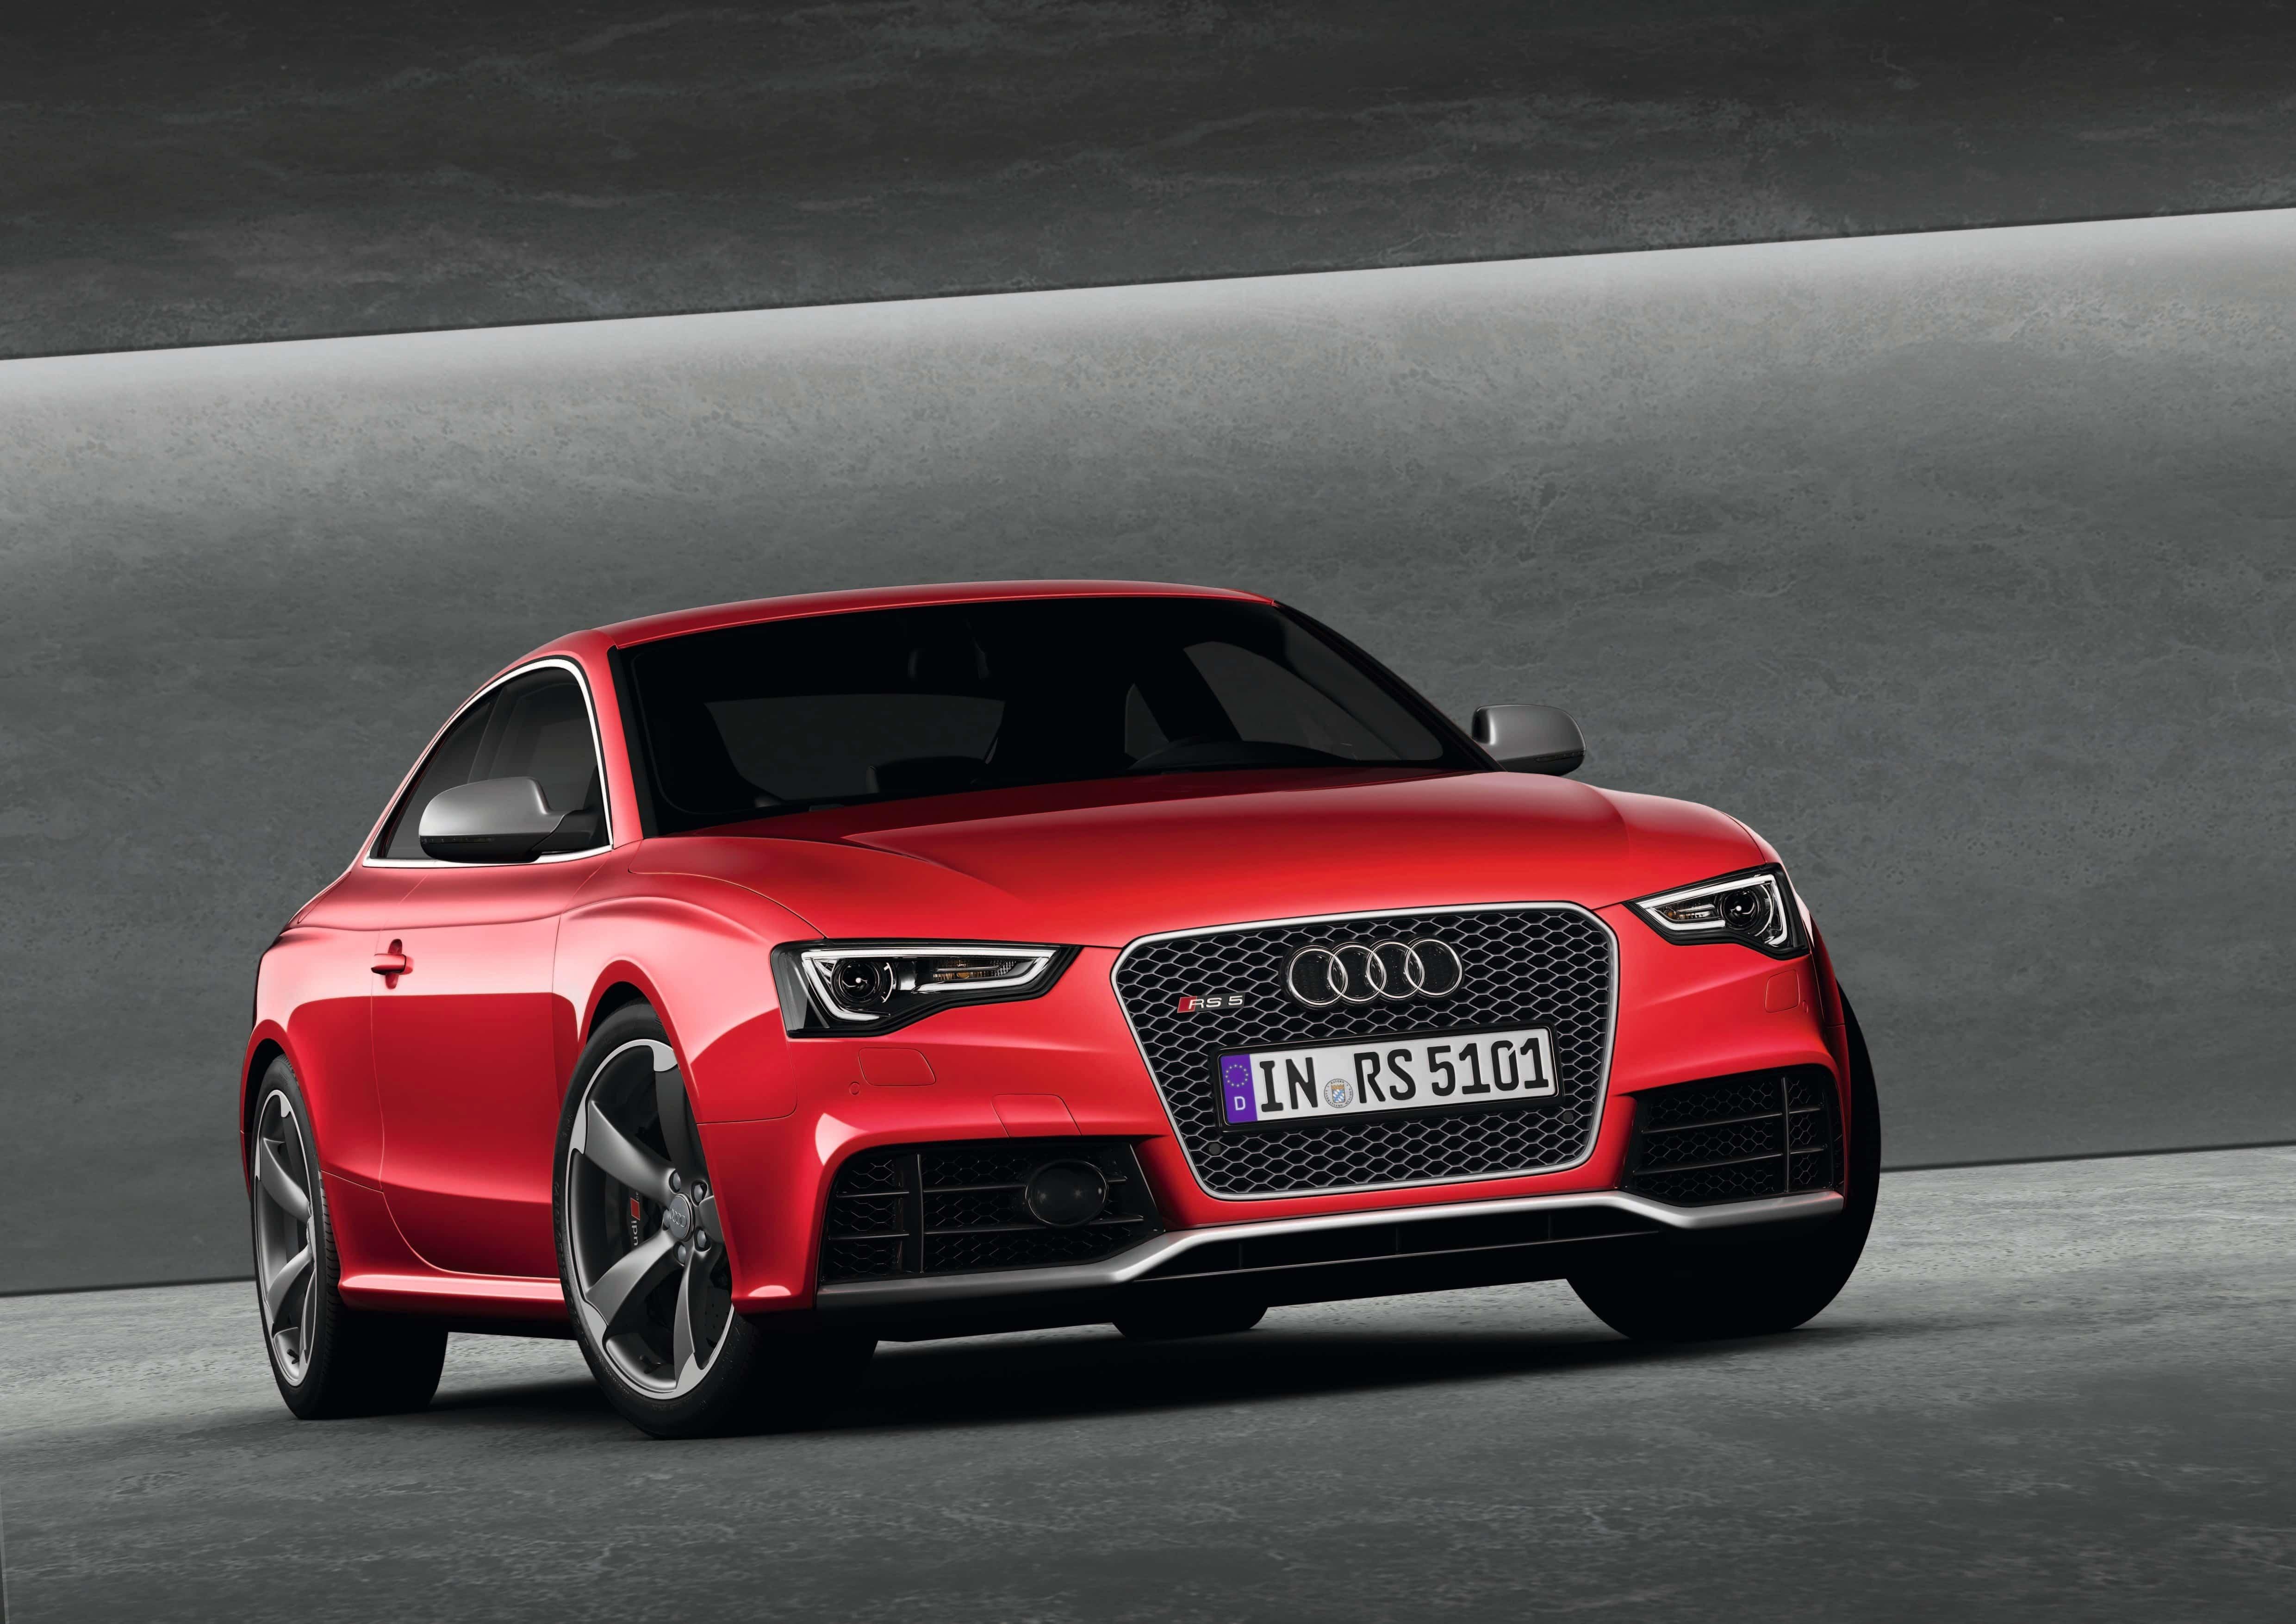 Inspektion bei einem Audi A5